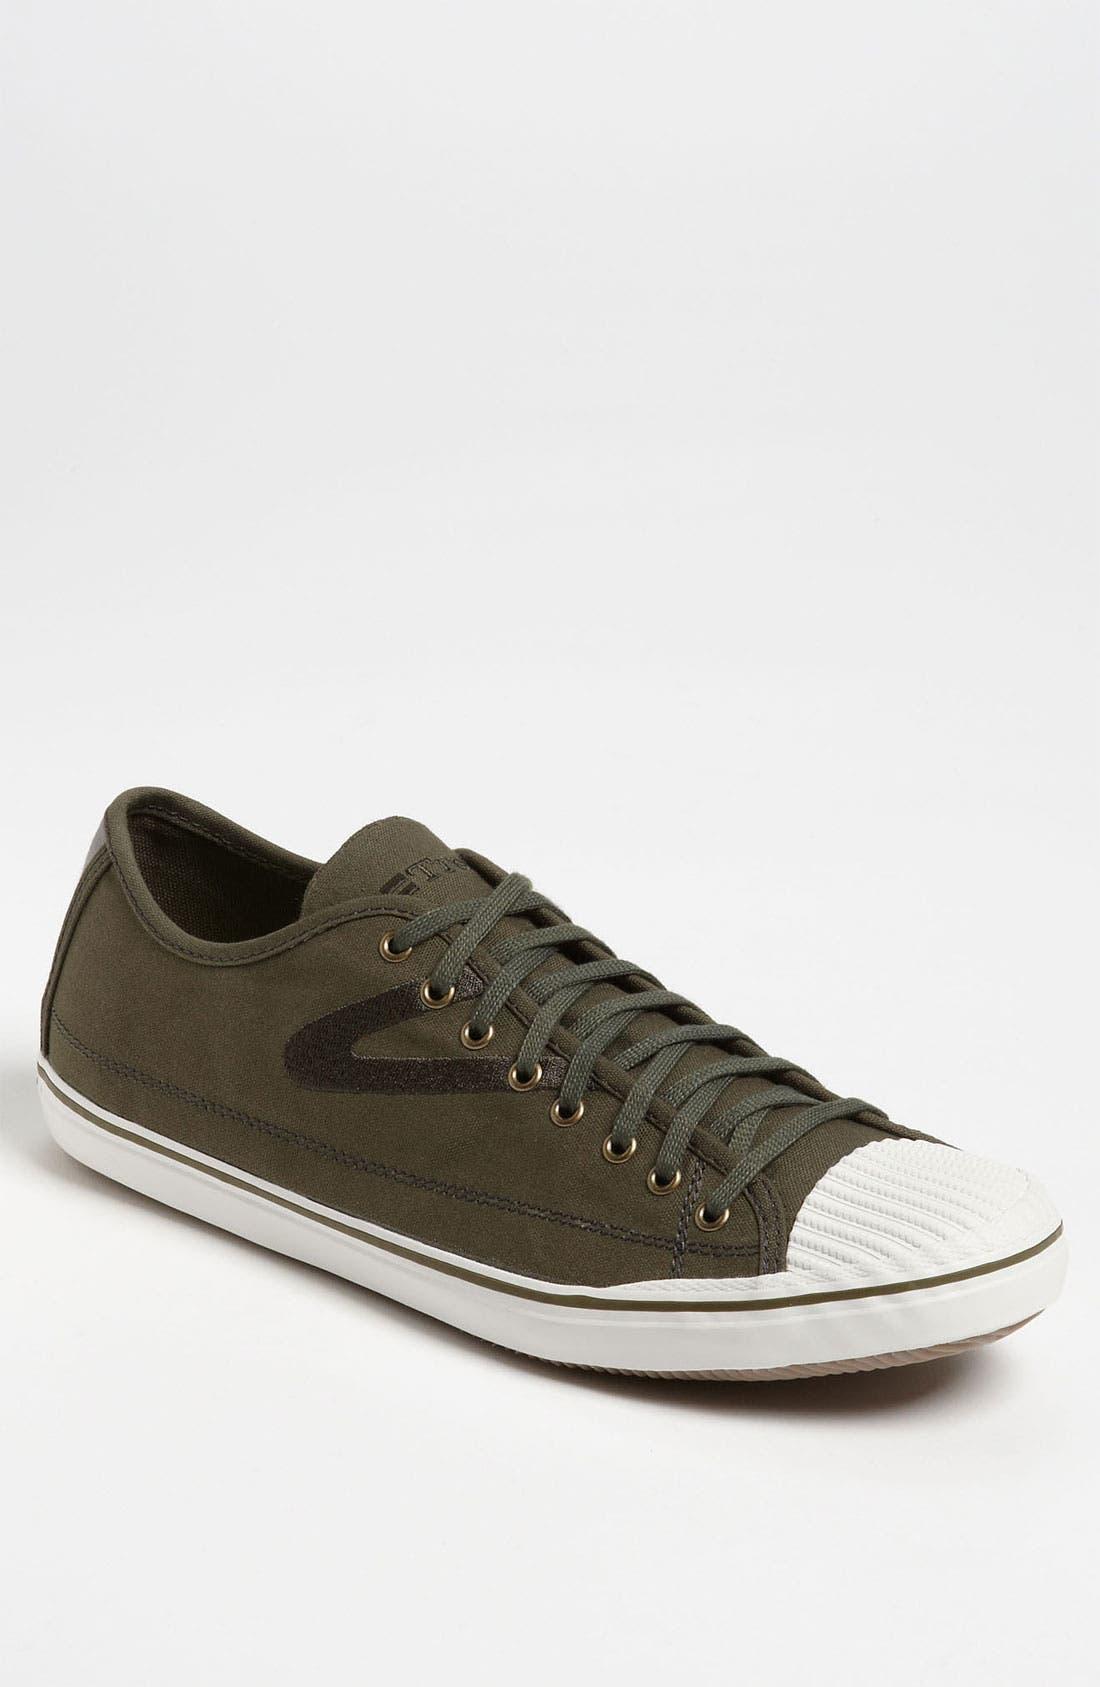 Alternate Image 1 Selected - Tretorn 'Skymra SL' Sneaker